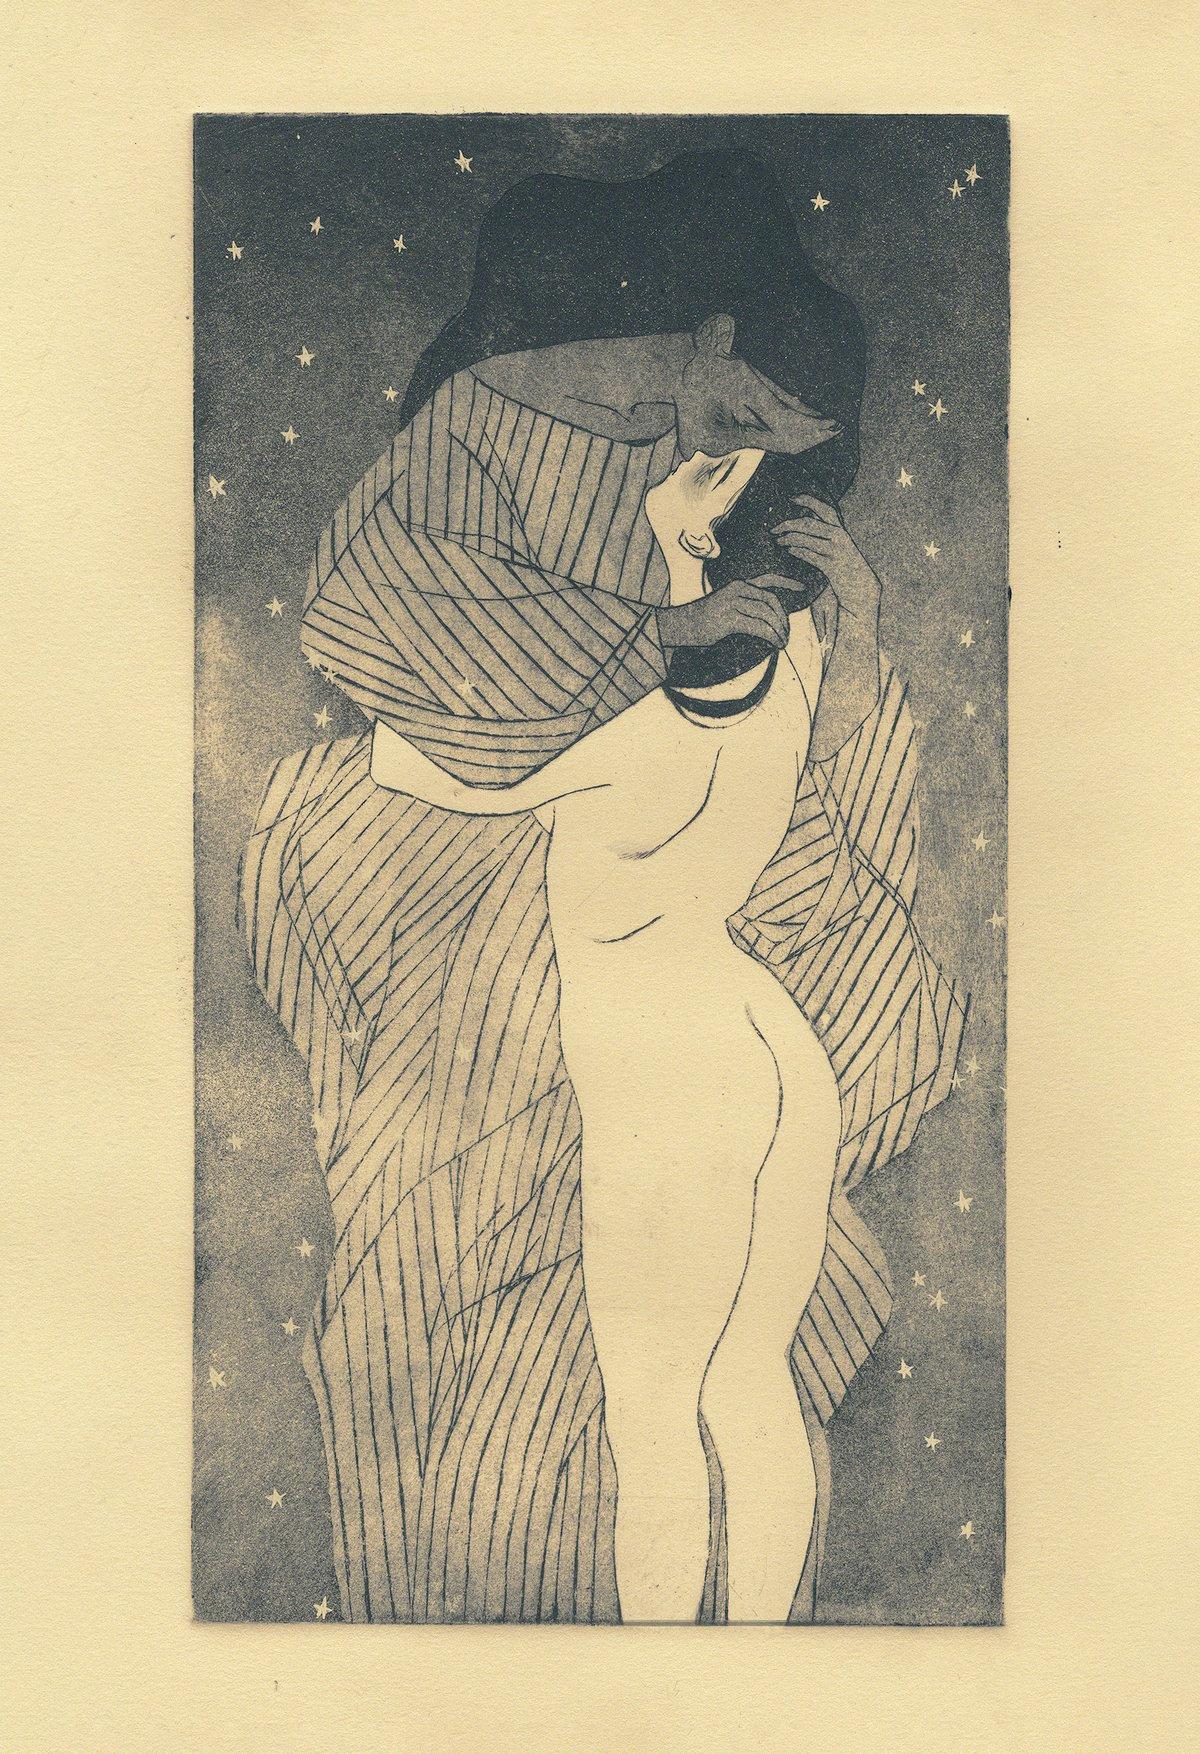 Image of stardust kisses